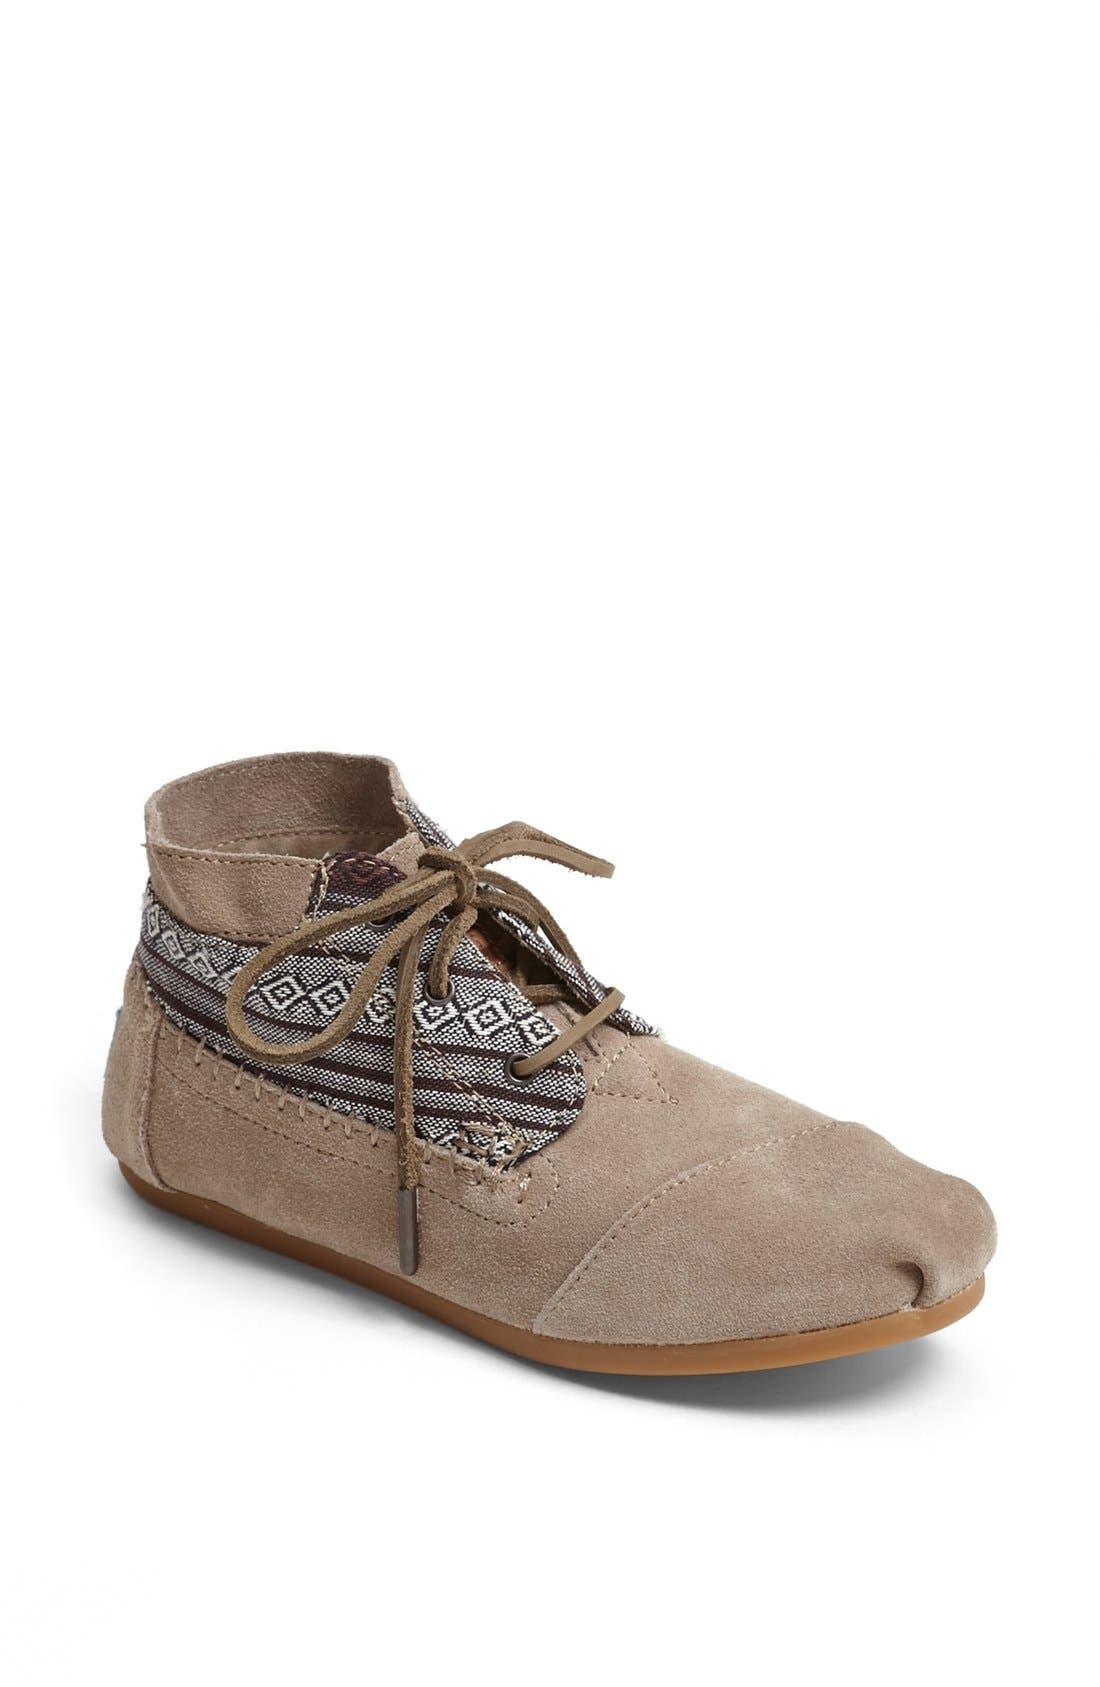 Alternate Image 1 Selected - TOMS Pattern Boot (Women)